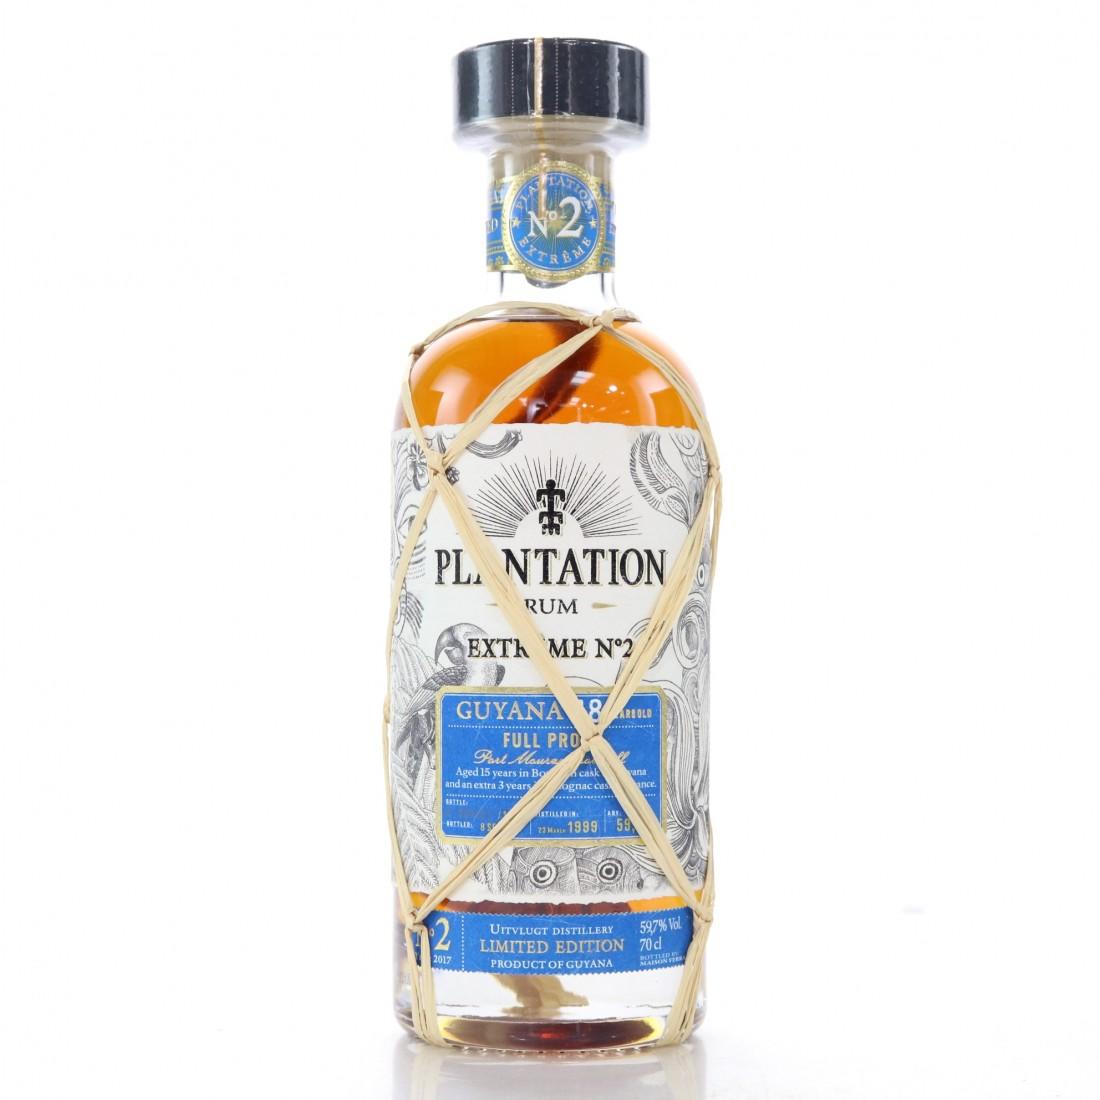 Uitvlugt 1999 Plantation 18 Year Old Extreme No.2 | Rum ...